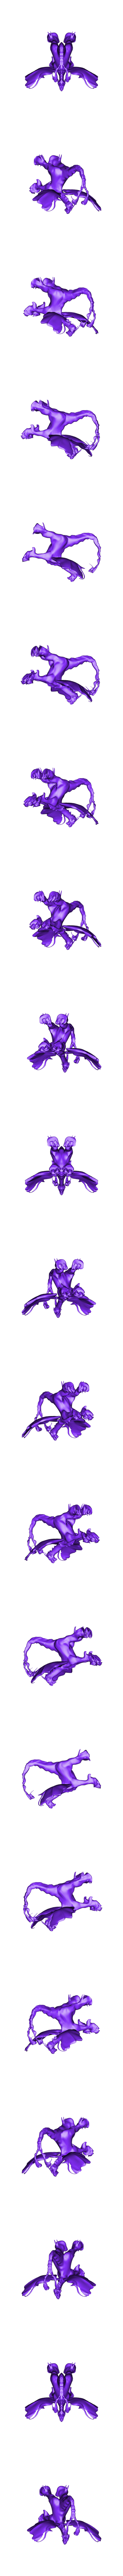 dragon scorpion (repaired).stl Download STL file Scorpion Dragon • 3D print model, Majin59